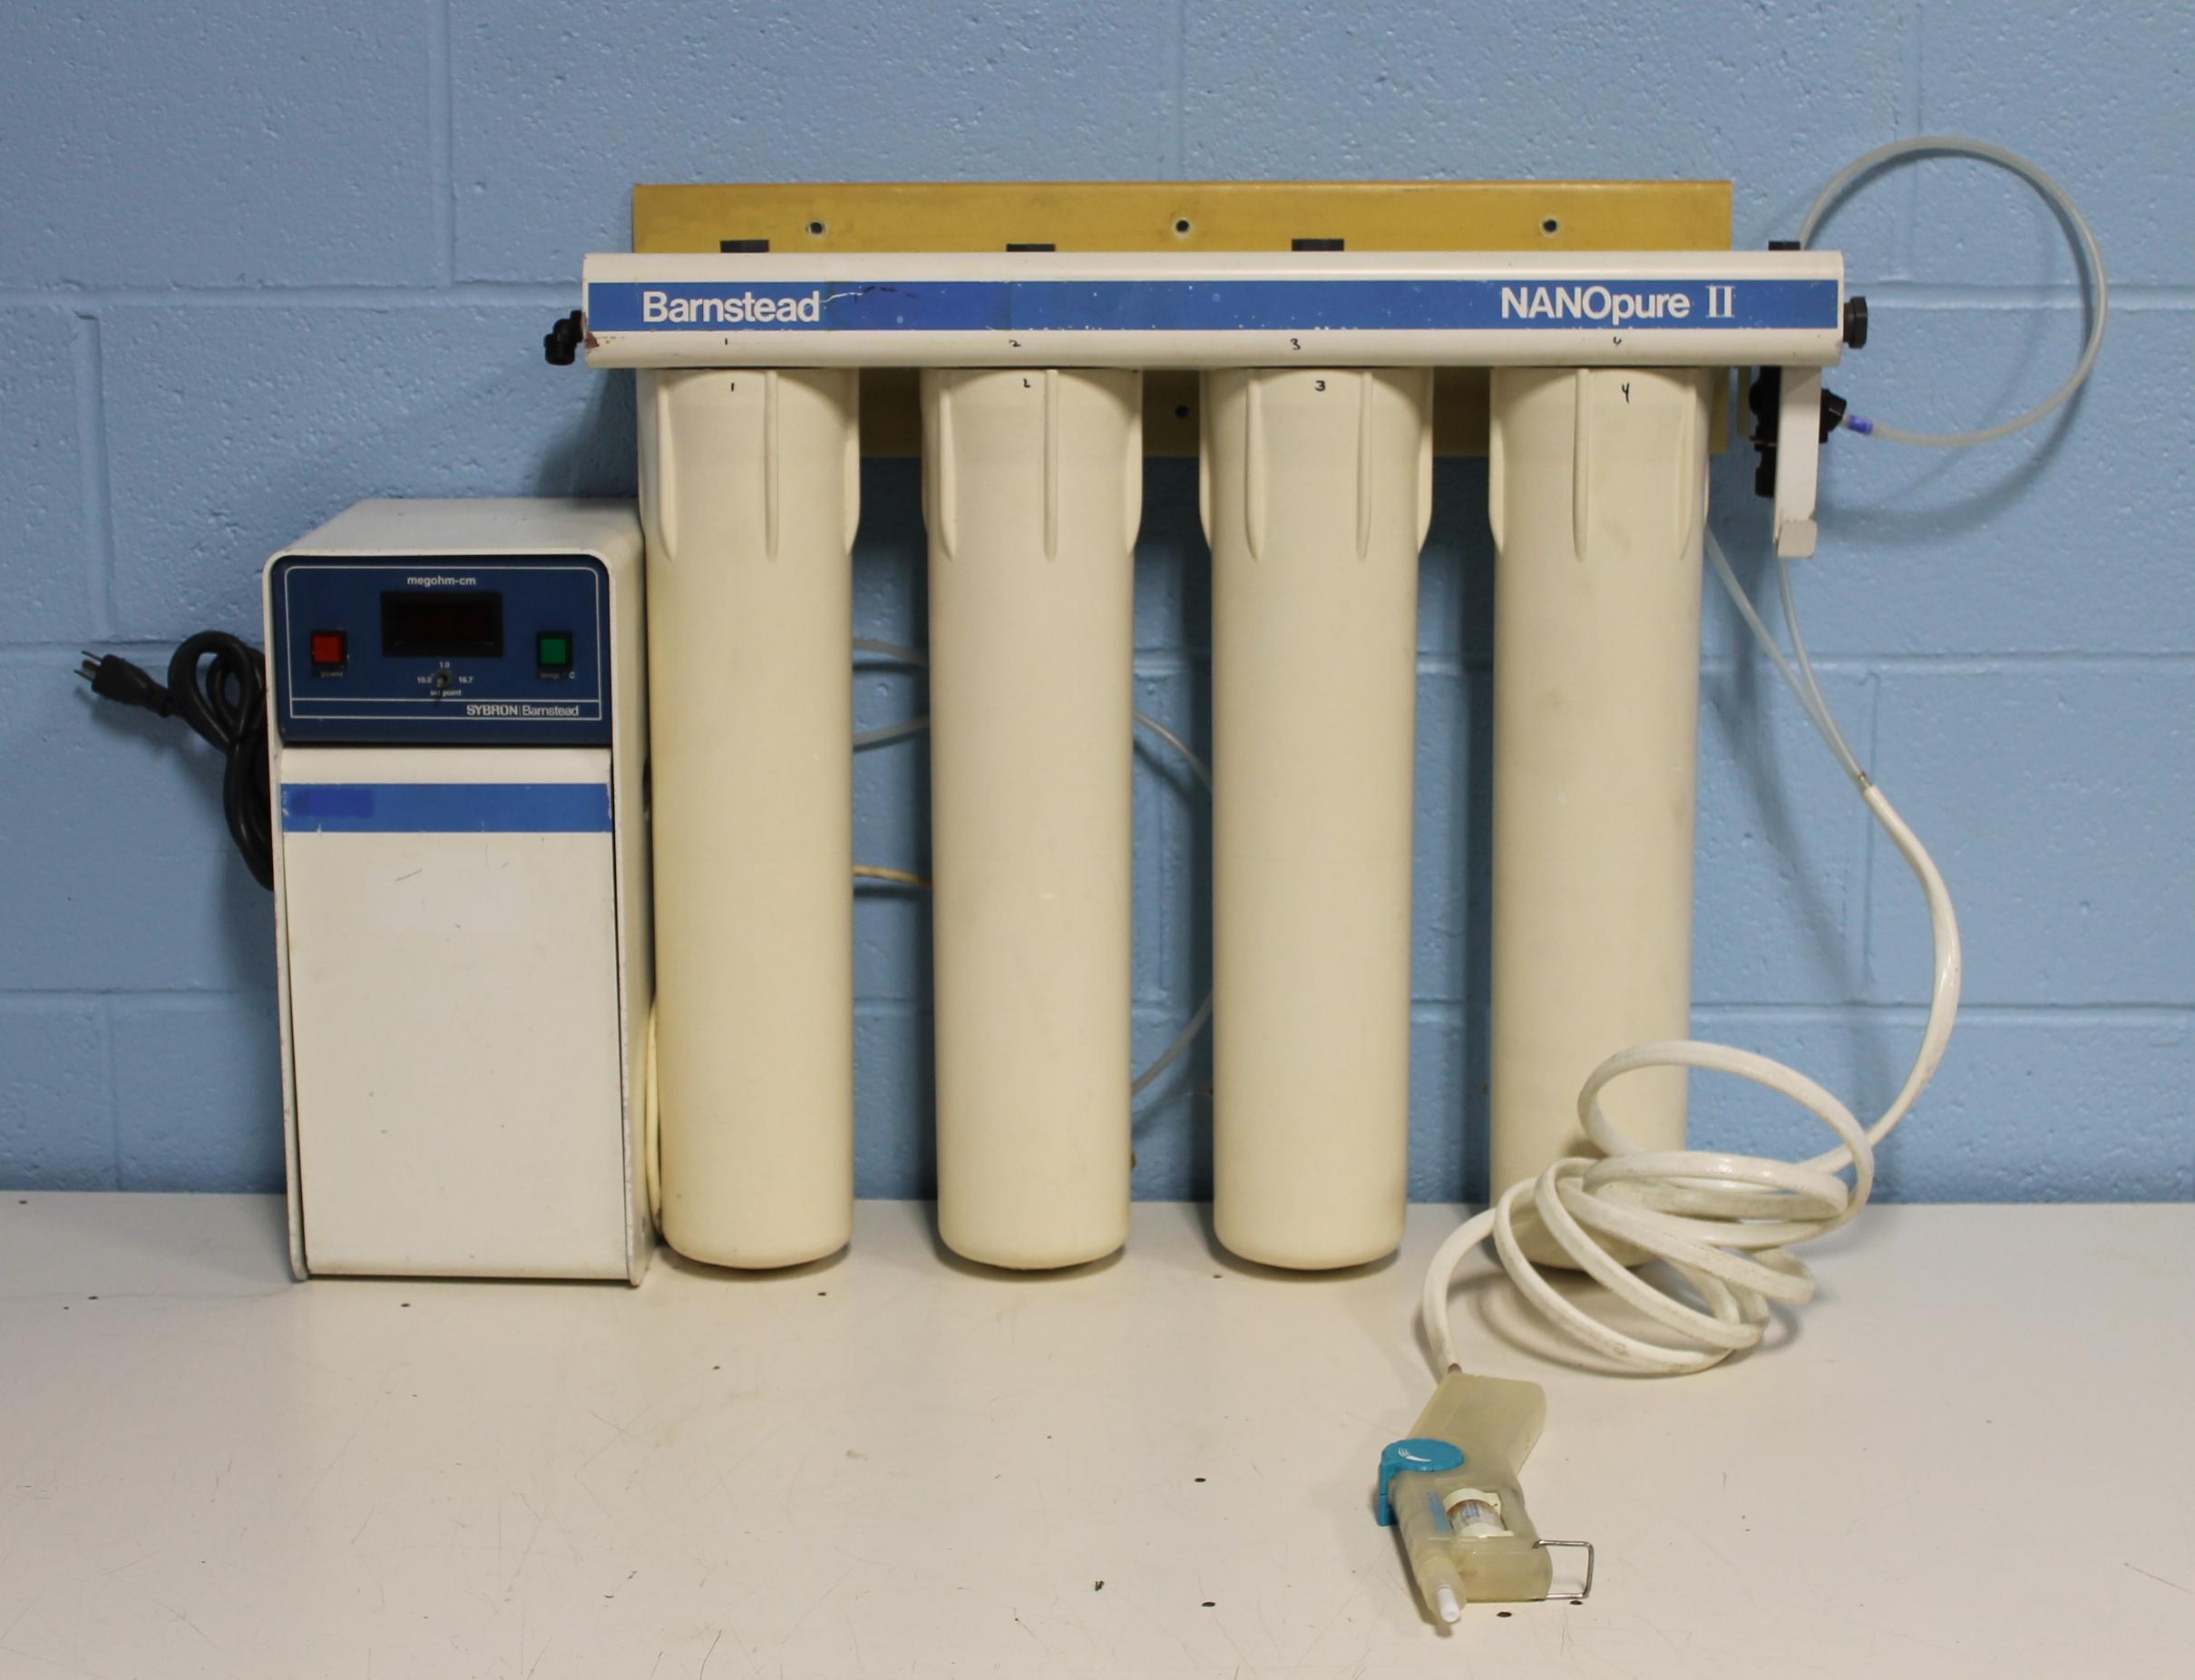 Refurbished Barnstead Sybron Nanopure Ii 4 Module Water